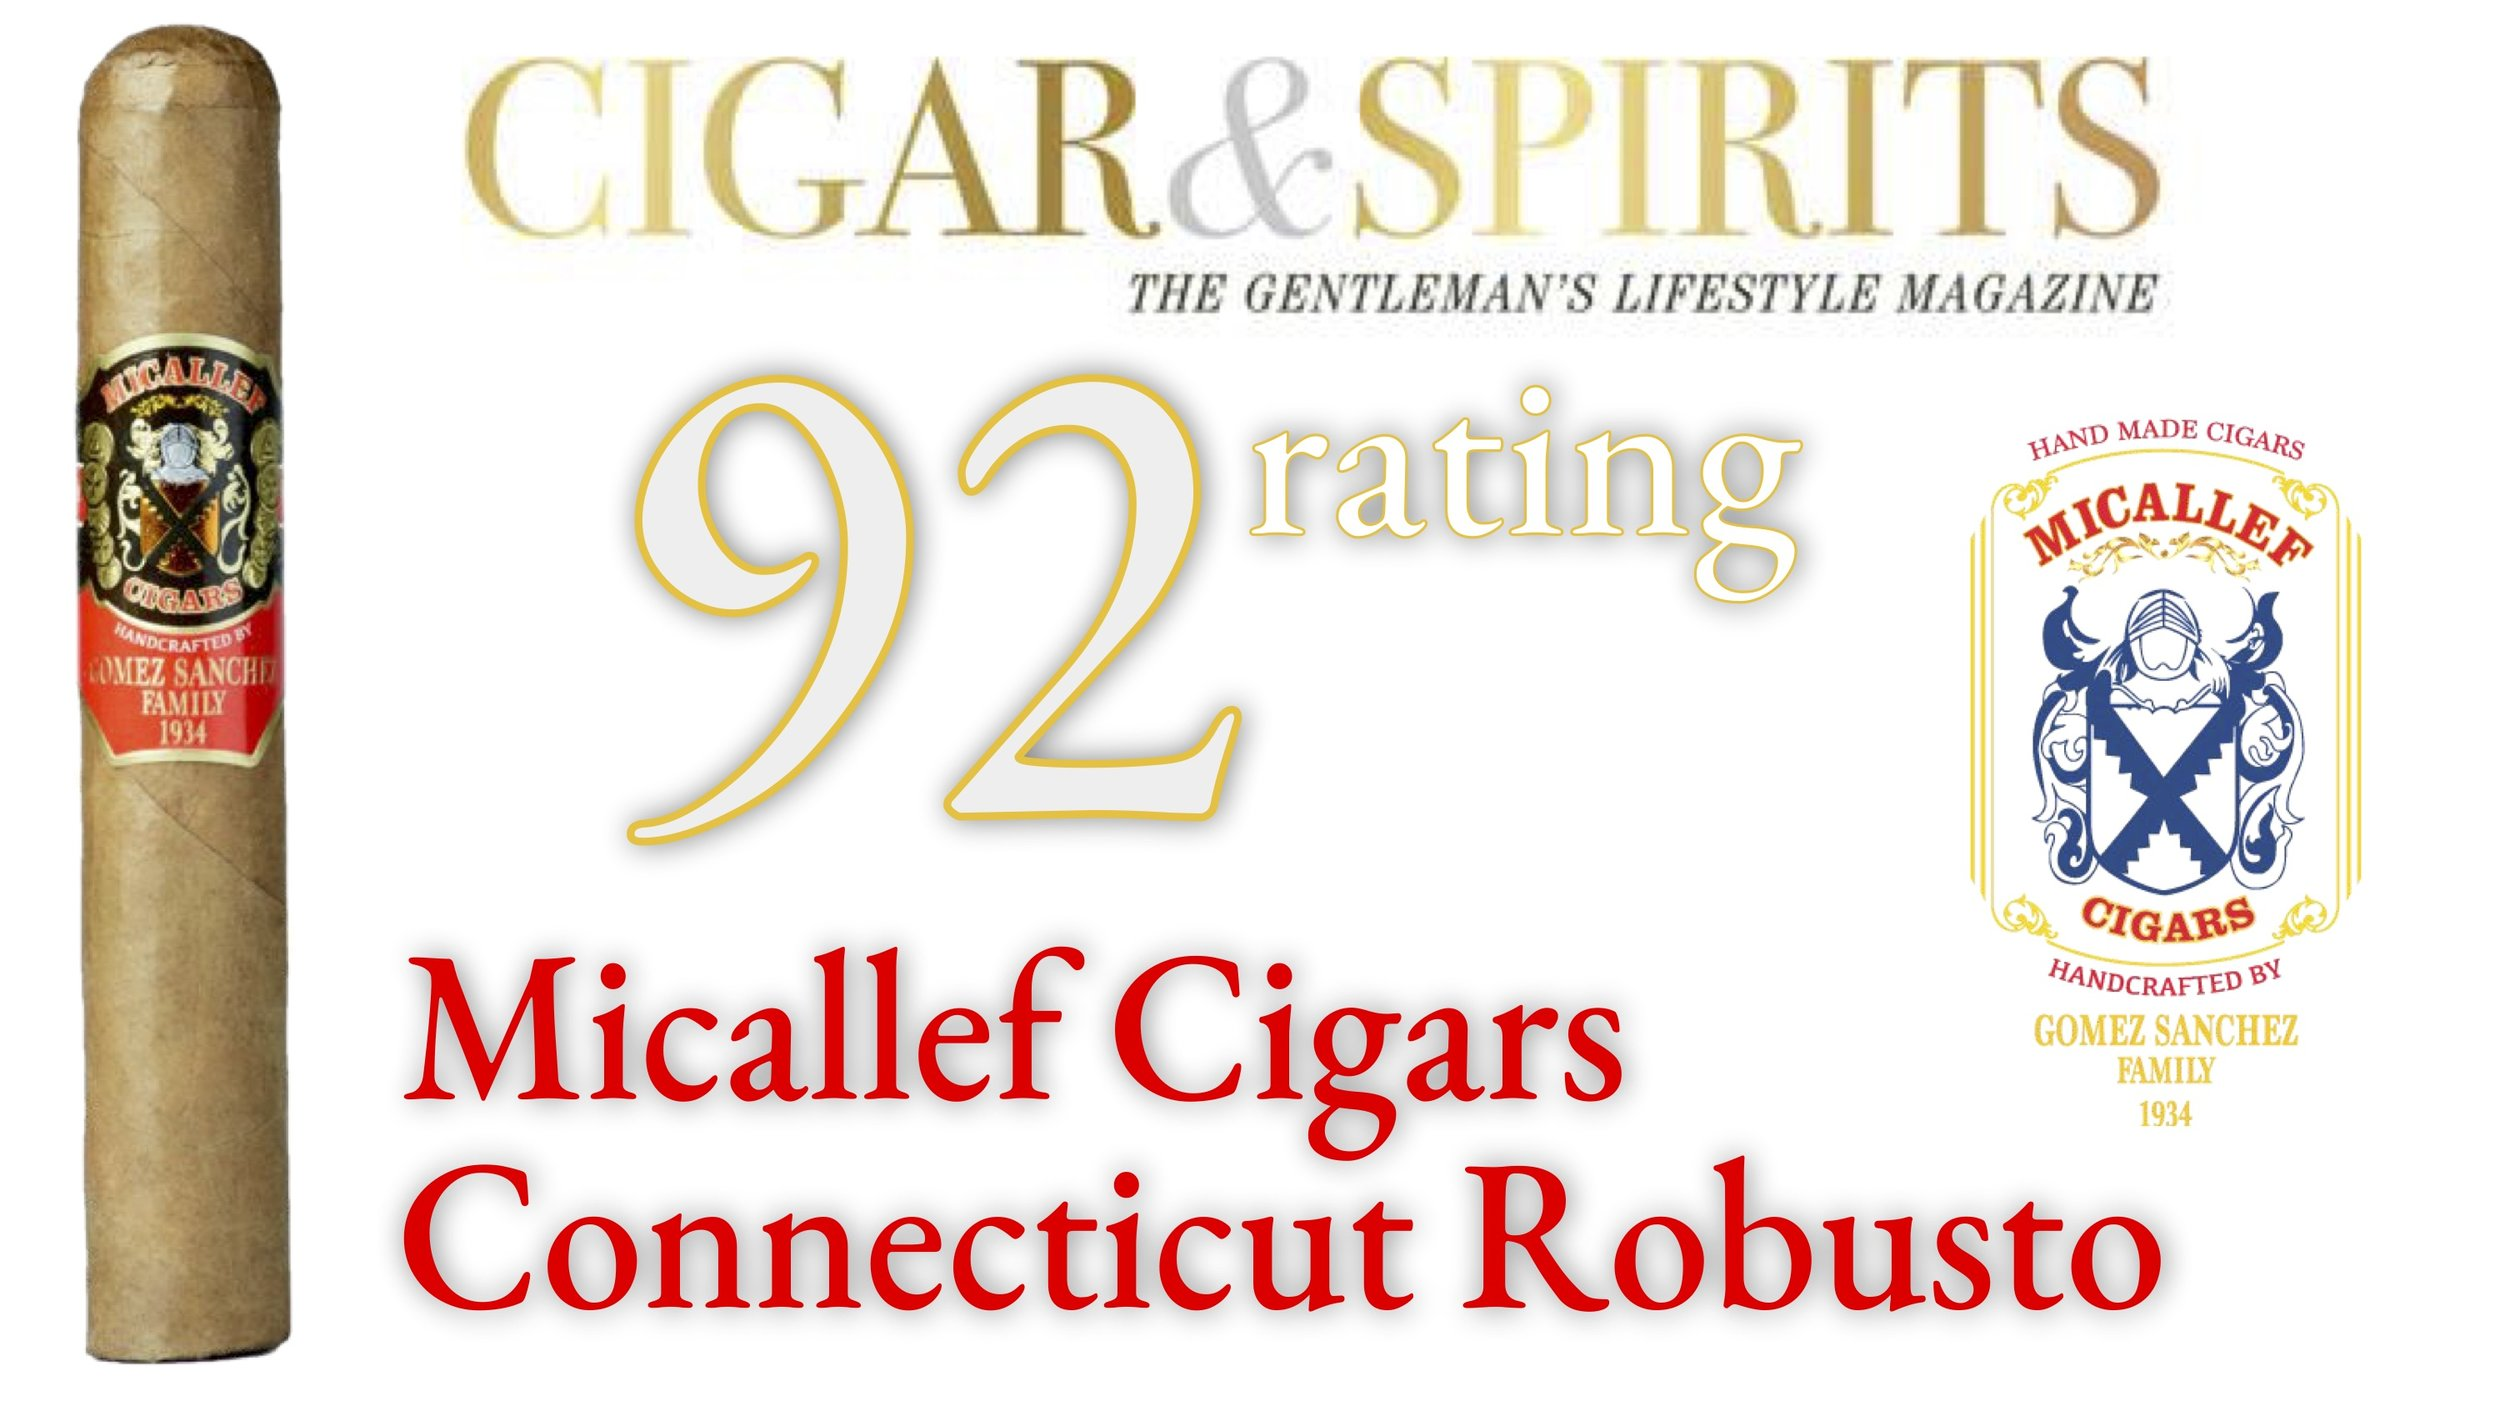 Micallef - connecticut cigar and spirits 92.jpg